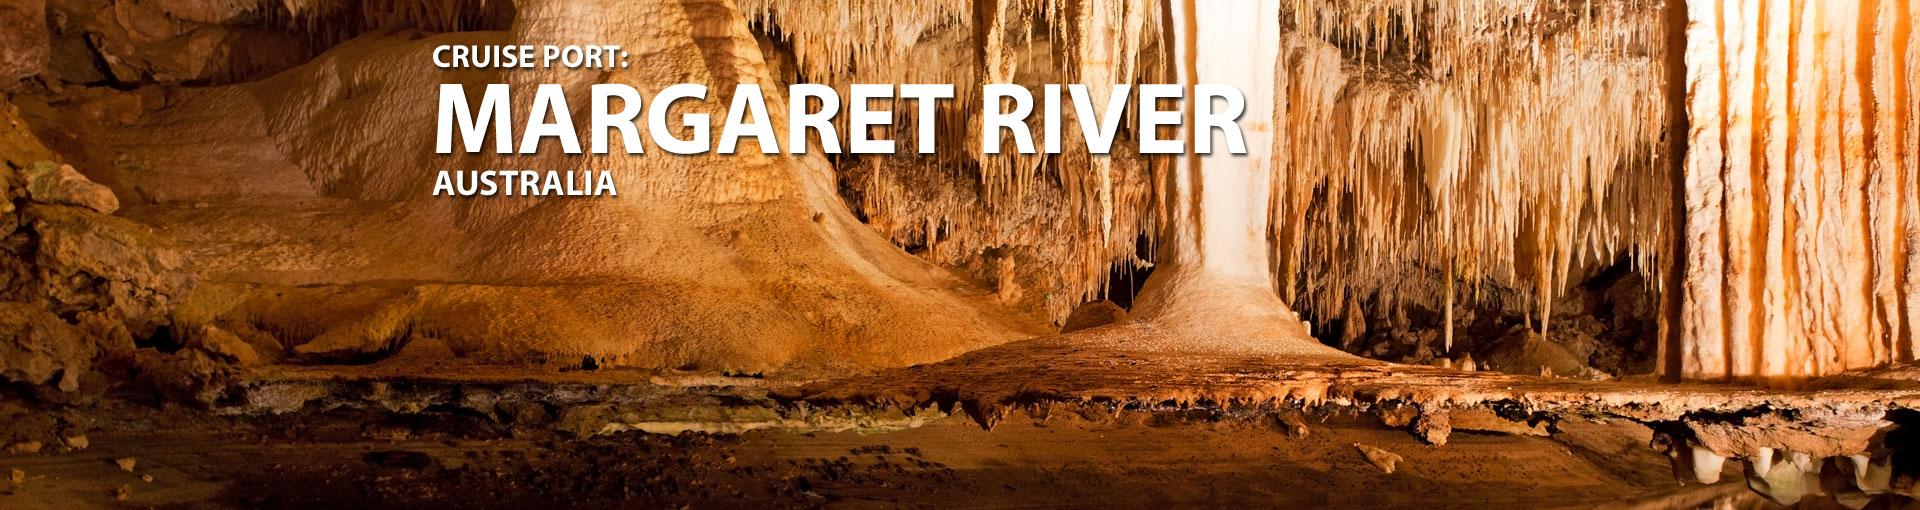 Cruises to Margaret River, Australia